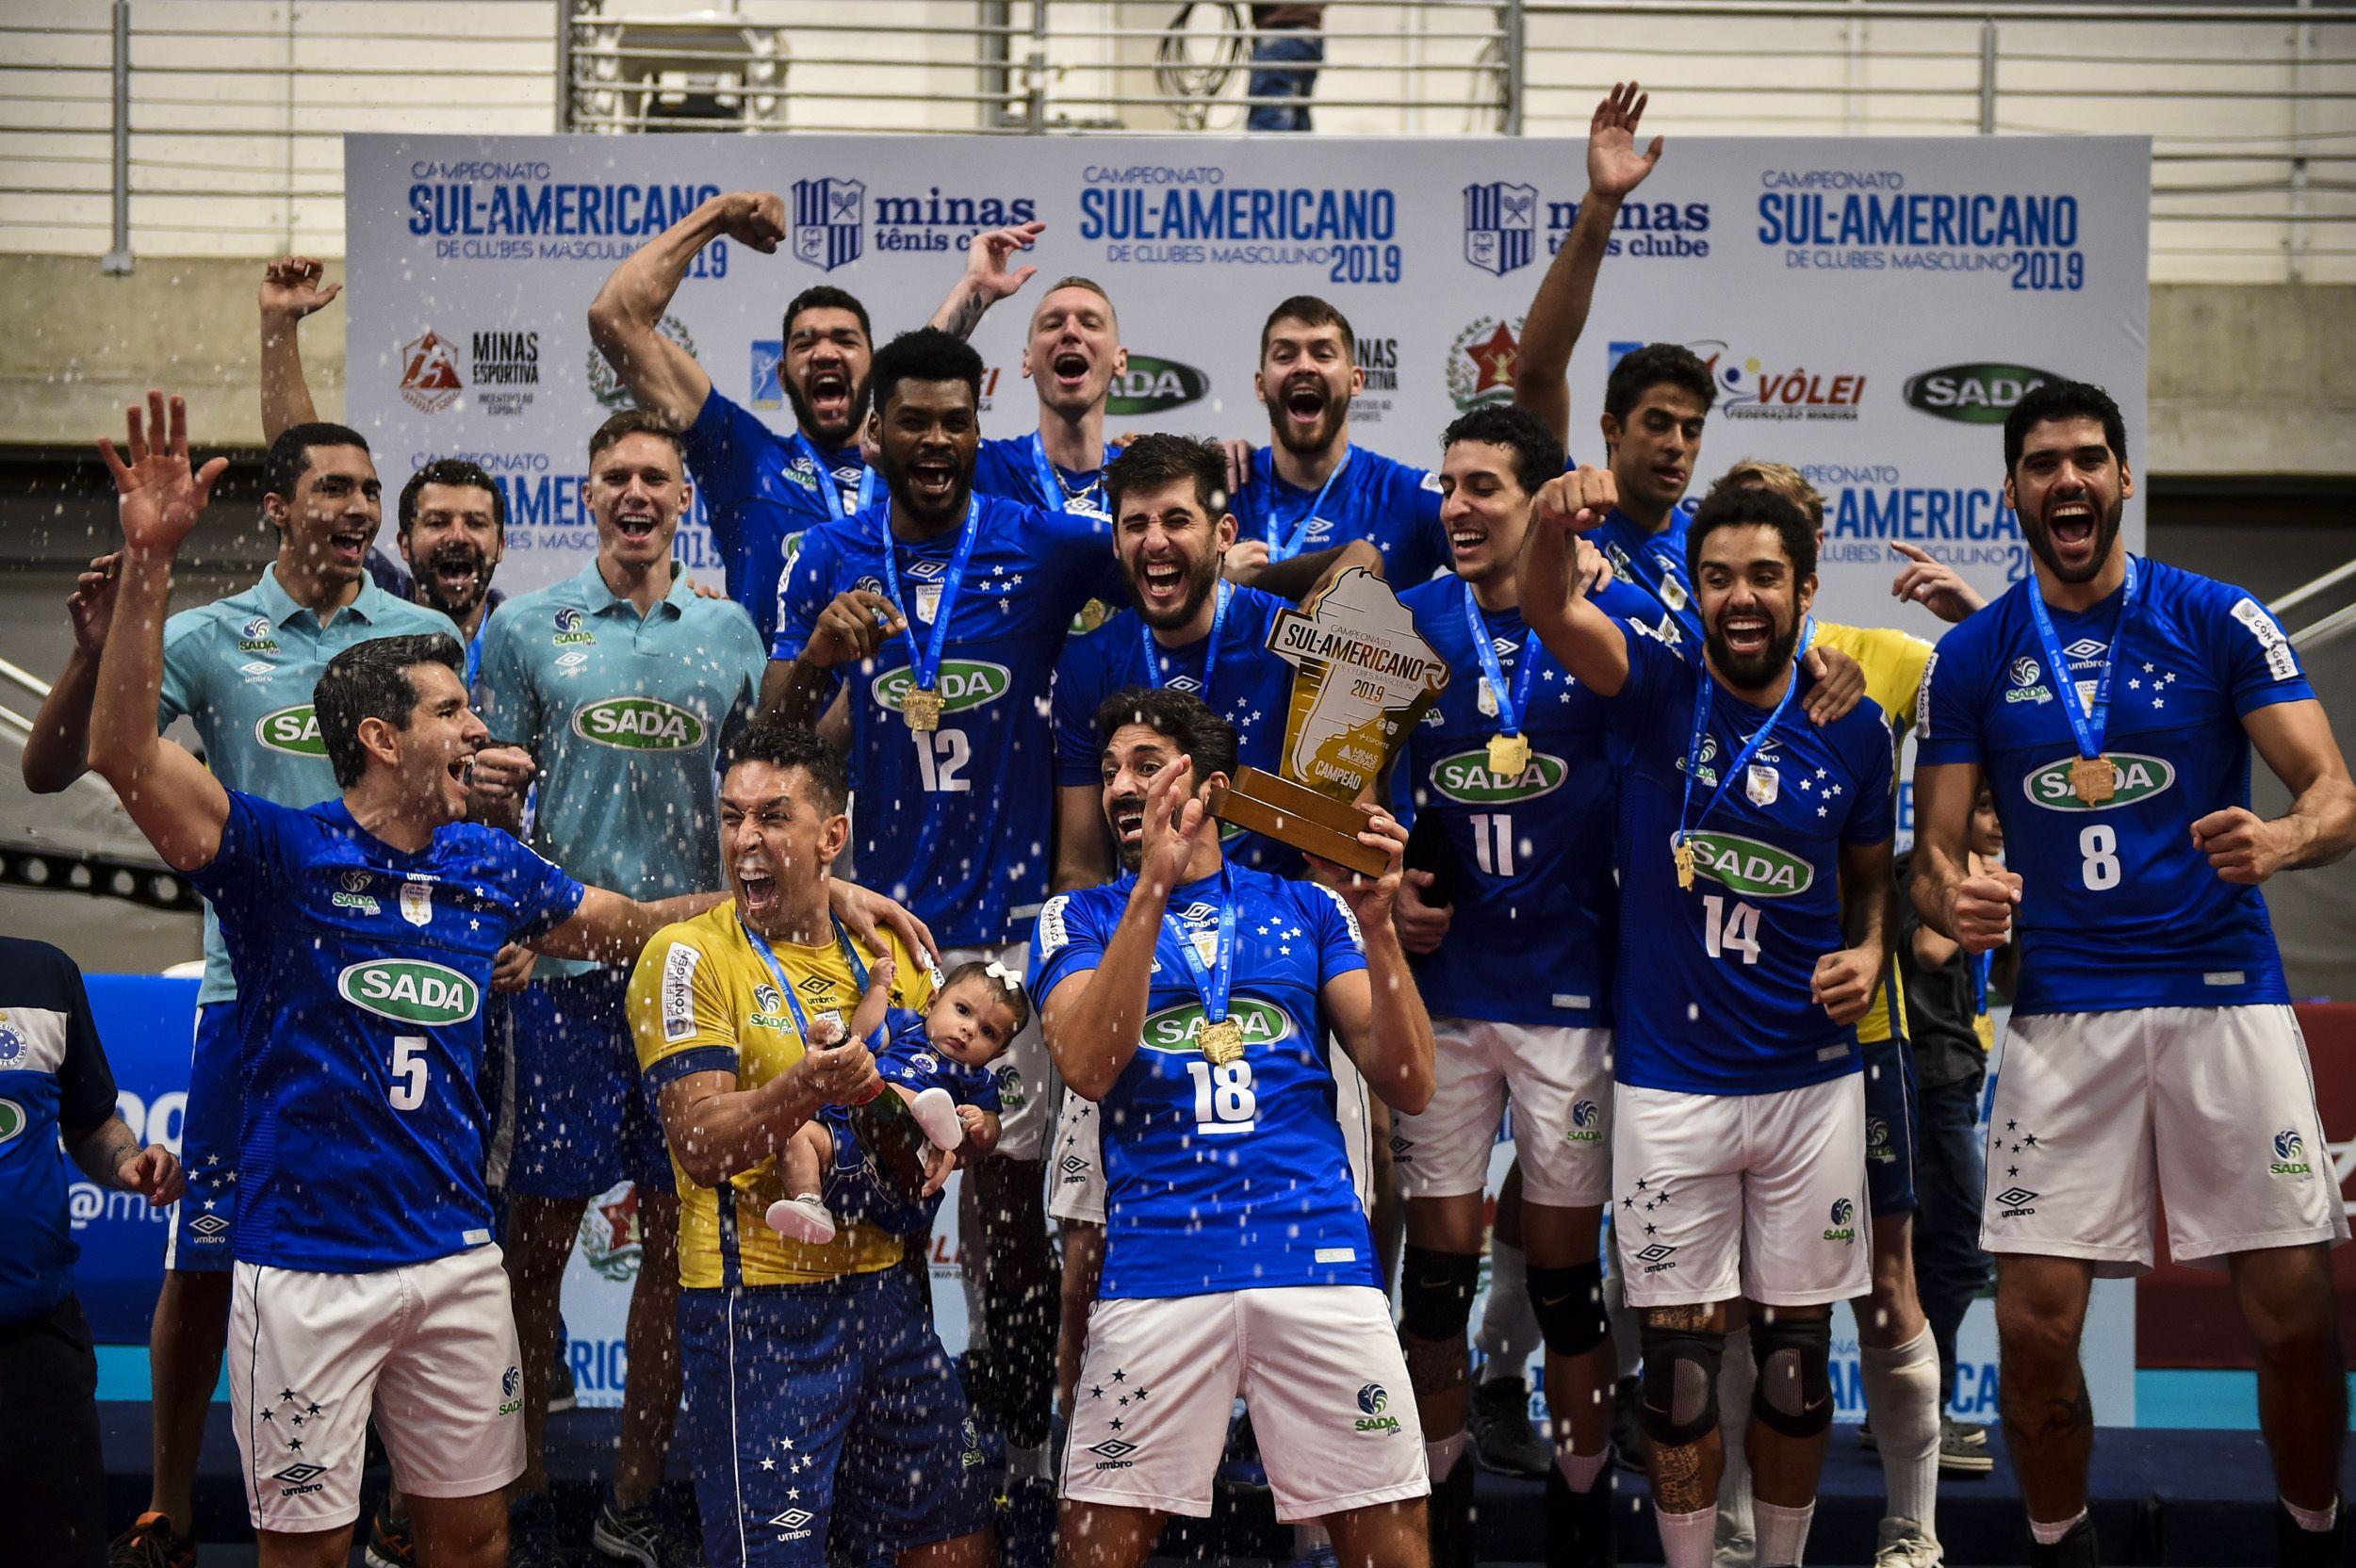 Sada Cruzeiro Historia Titulos Recordes Elenco E Idolos Sada Cruzeiro Cruzeiro Volei Masculino